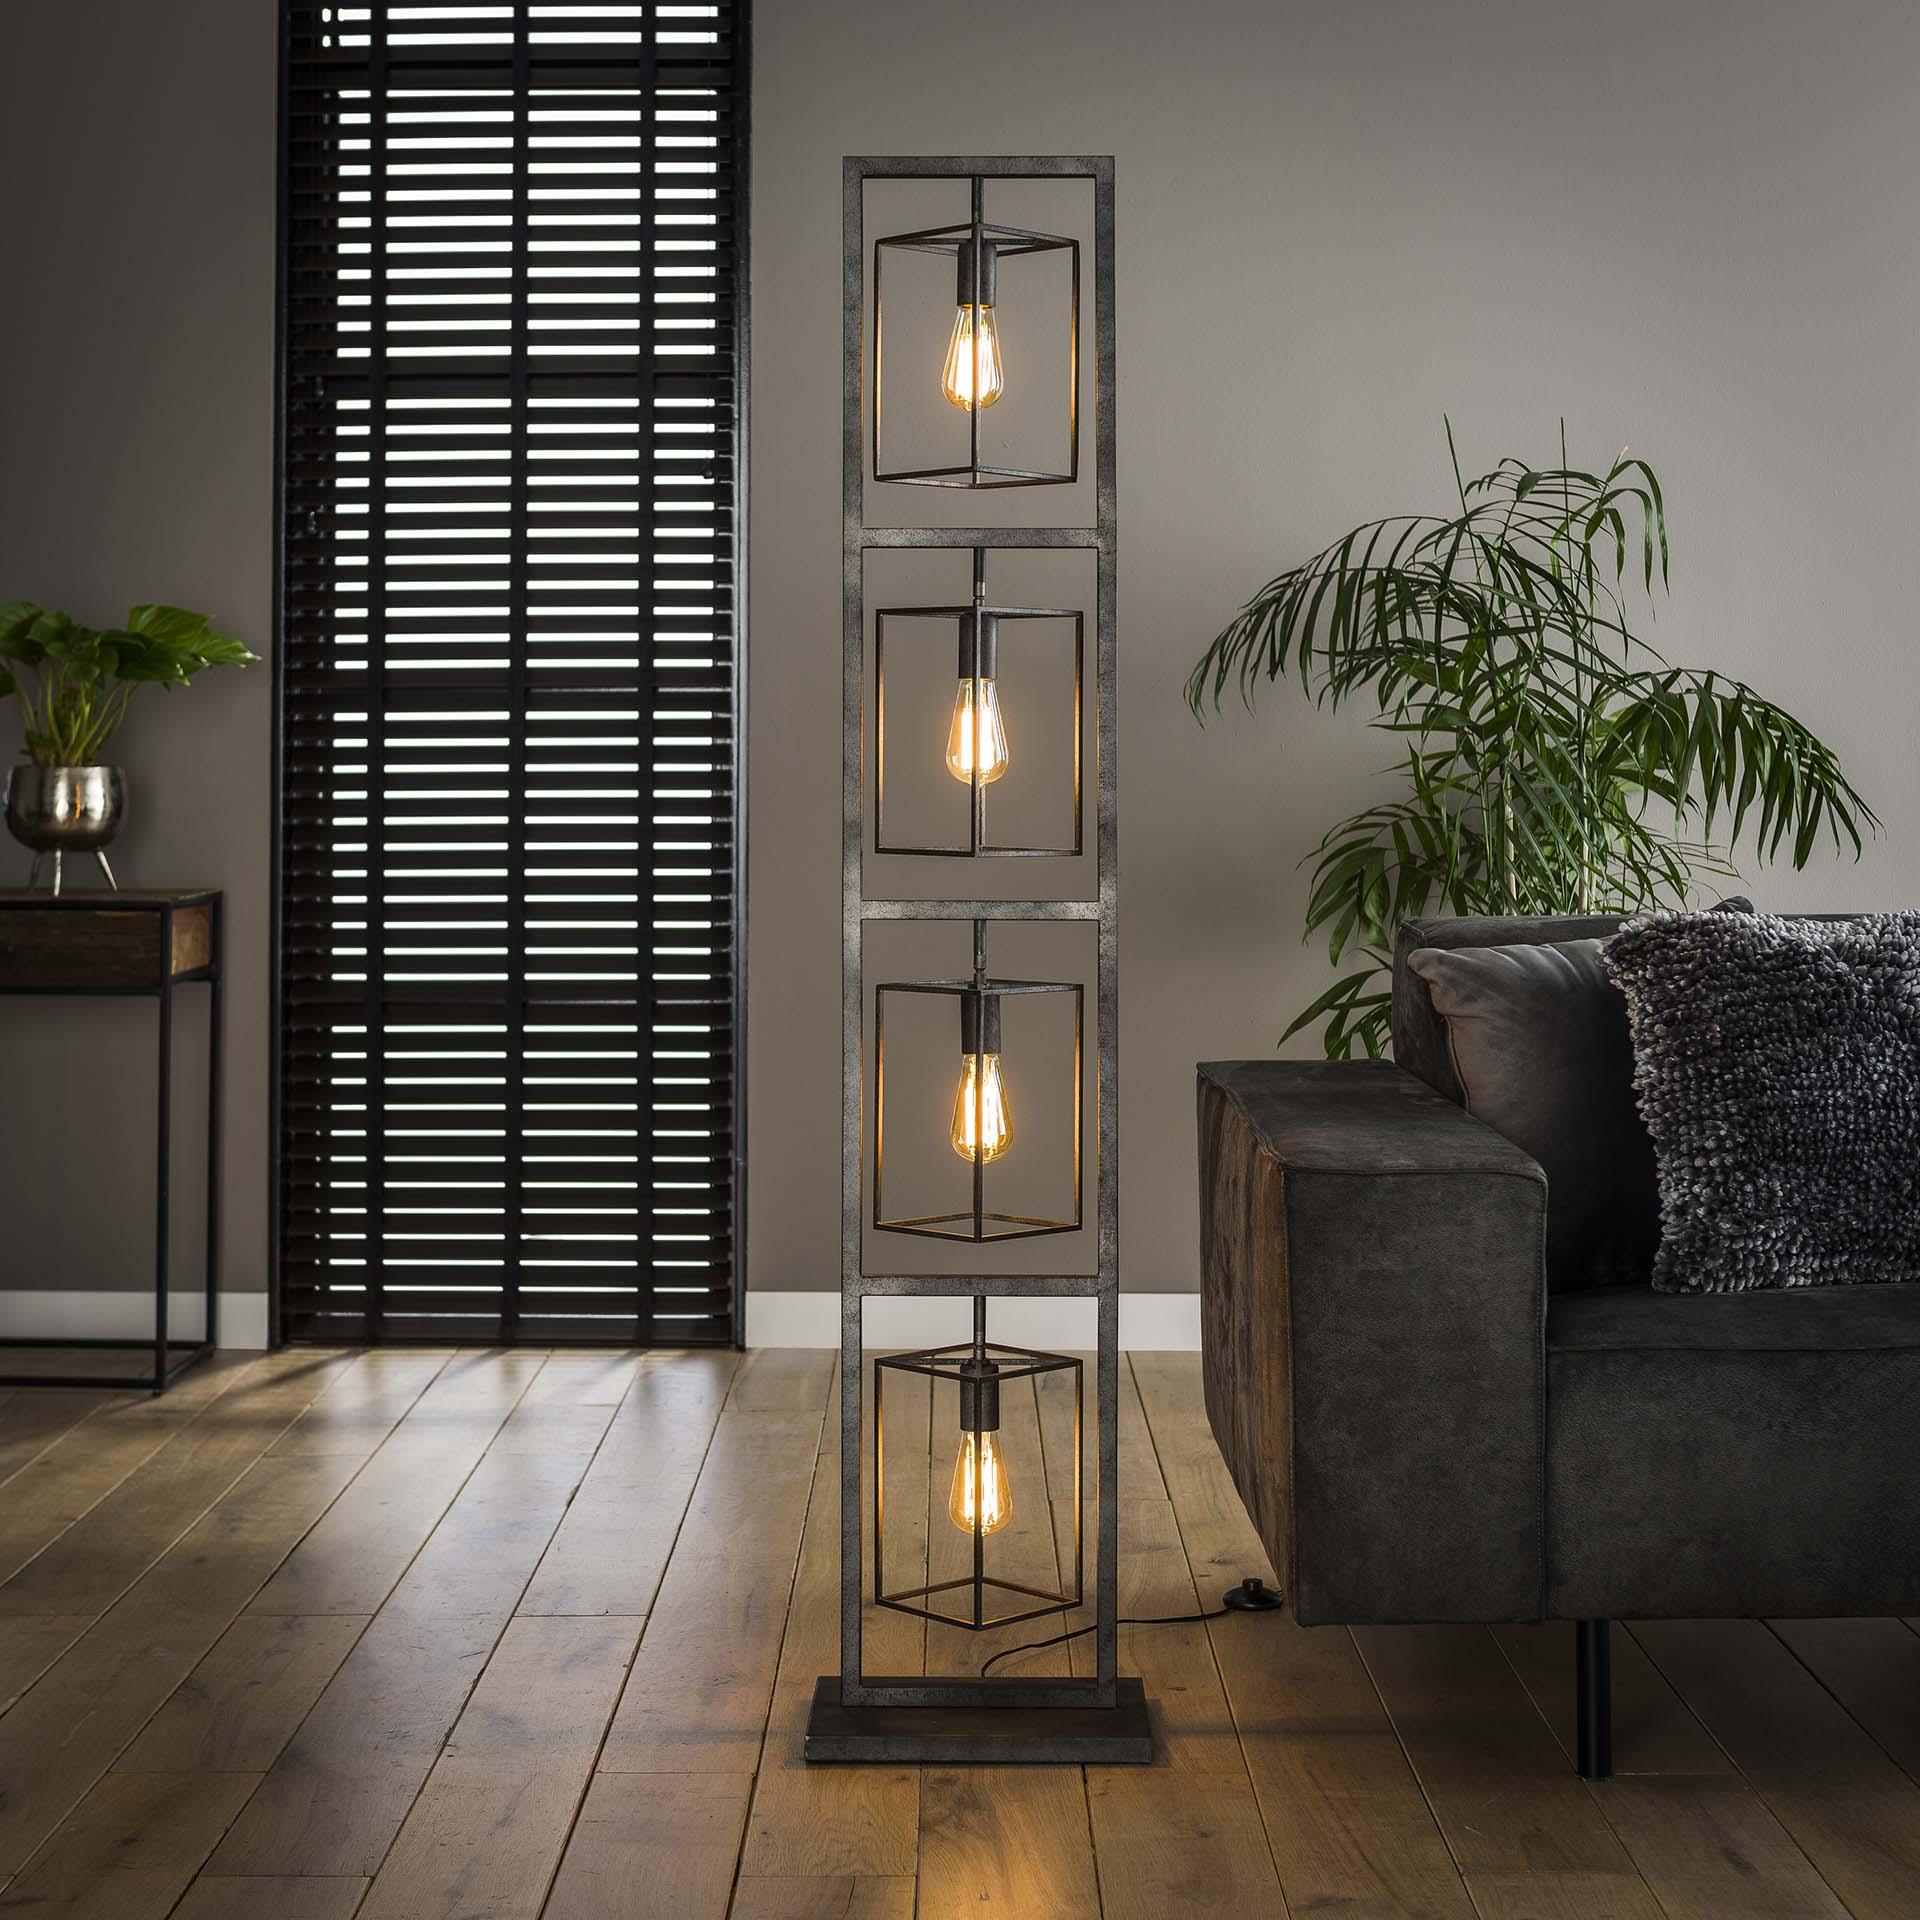 Vloerlamp 4x cubic tower Oud zilver